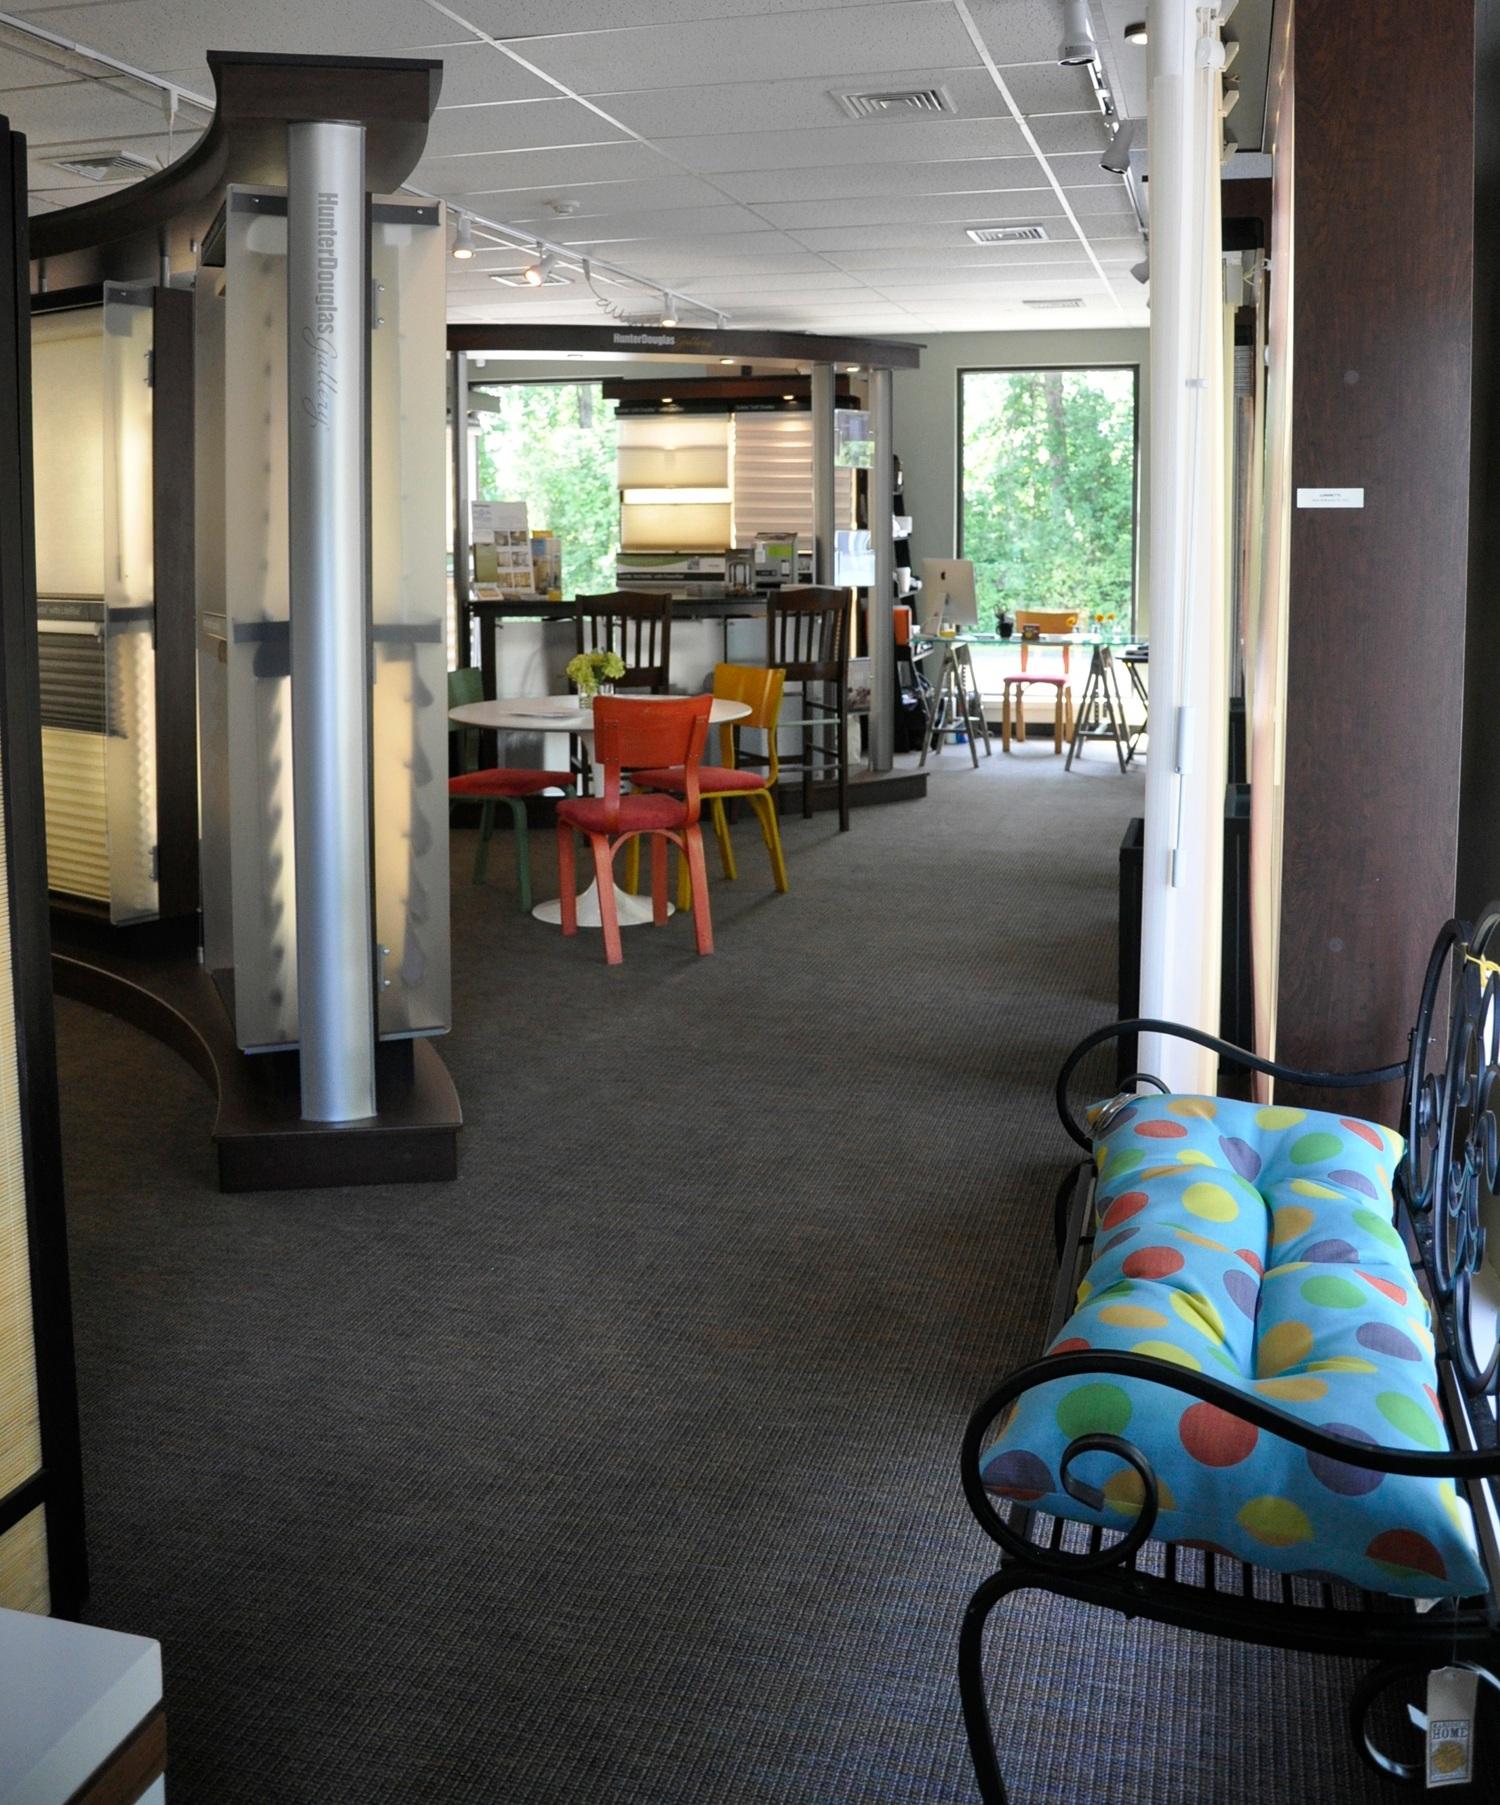 gallery1web.jpg